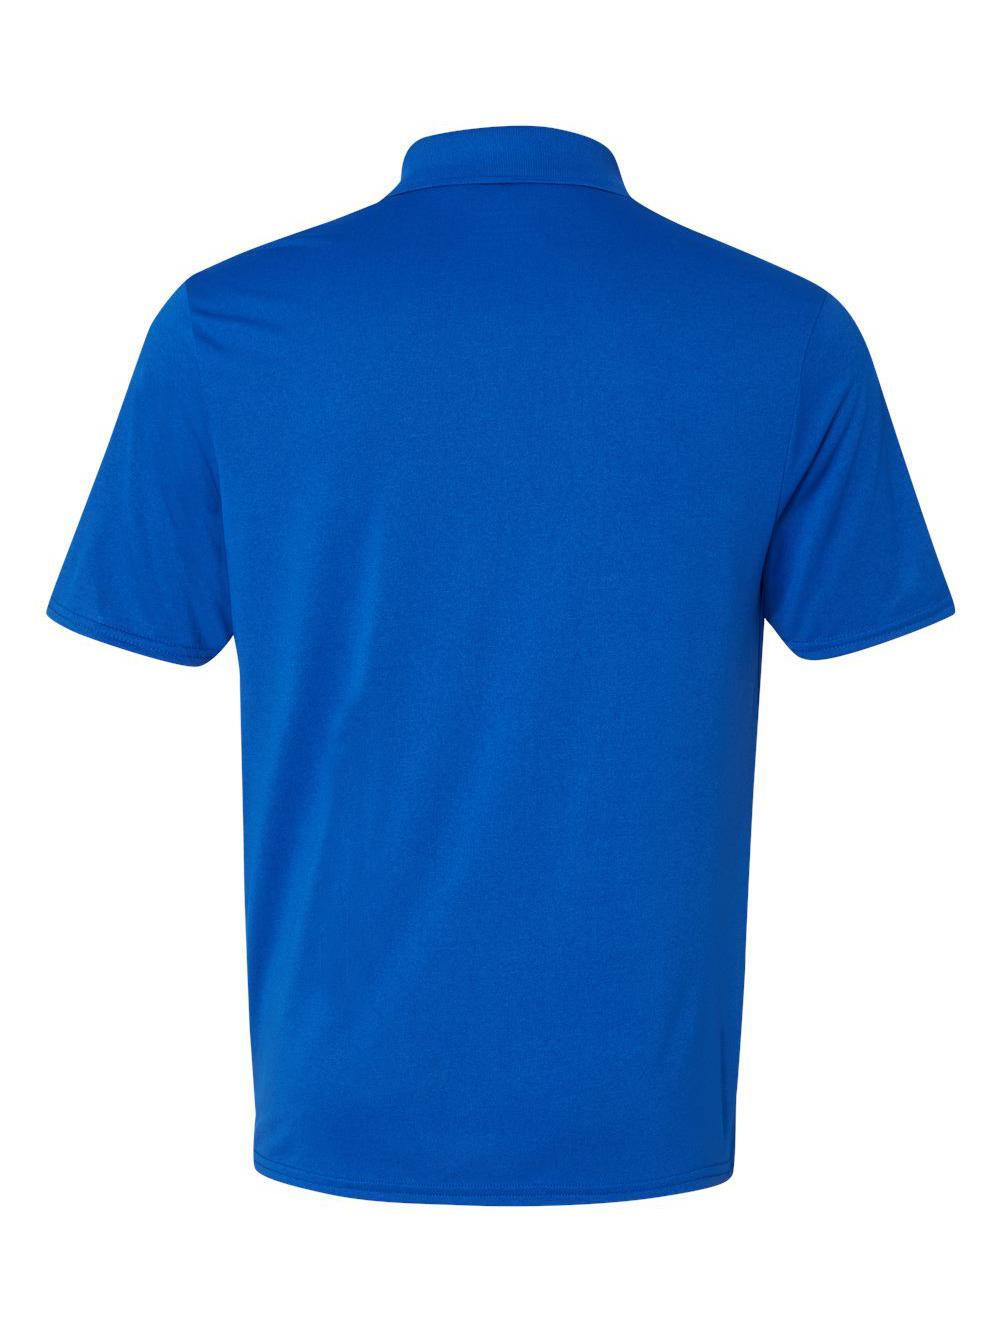 Gildan-Performance-Jersey-Sport-Shirt-44800 thumbnail 19